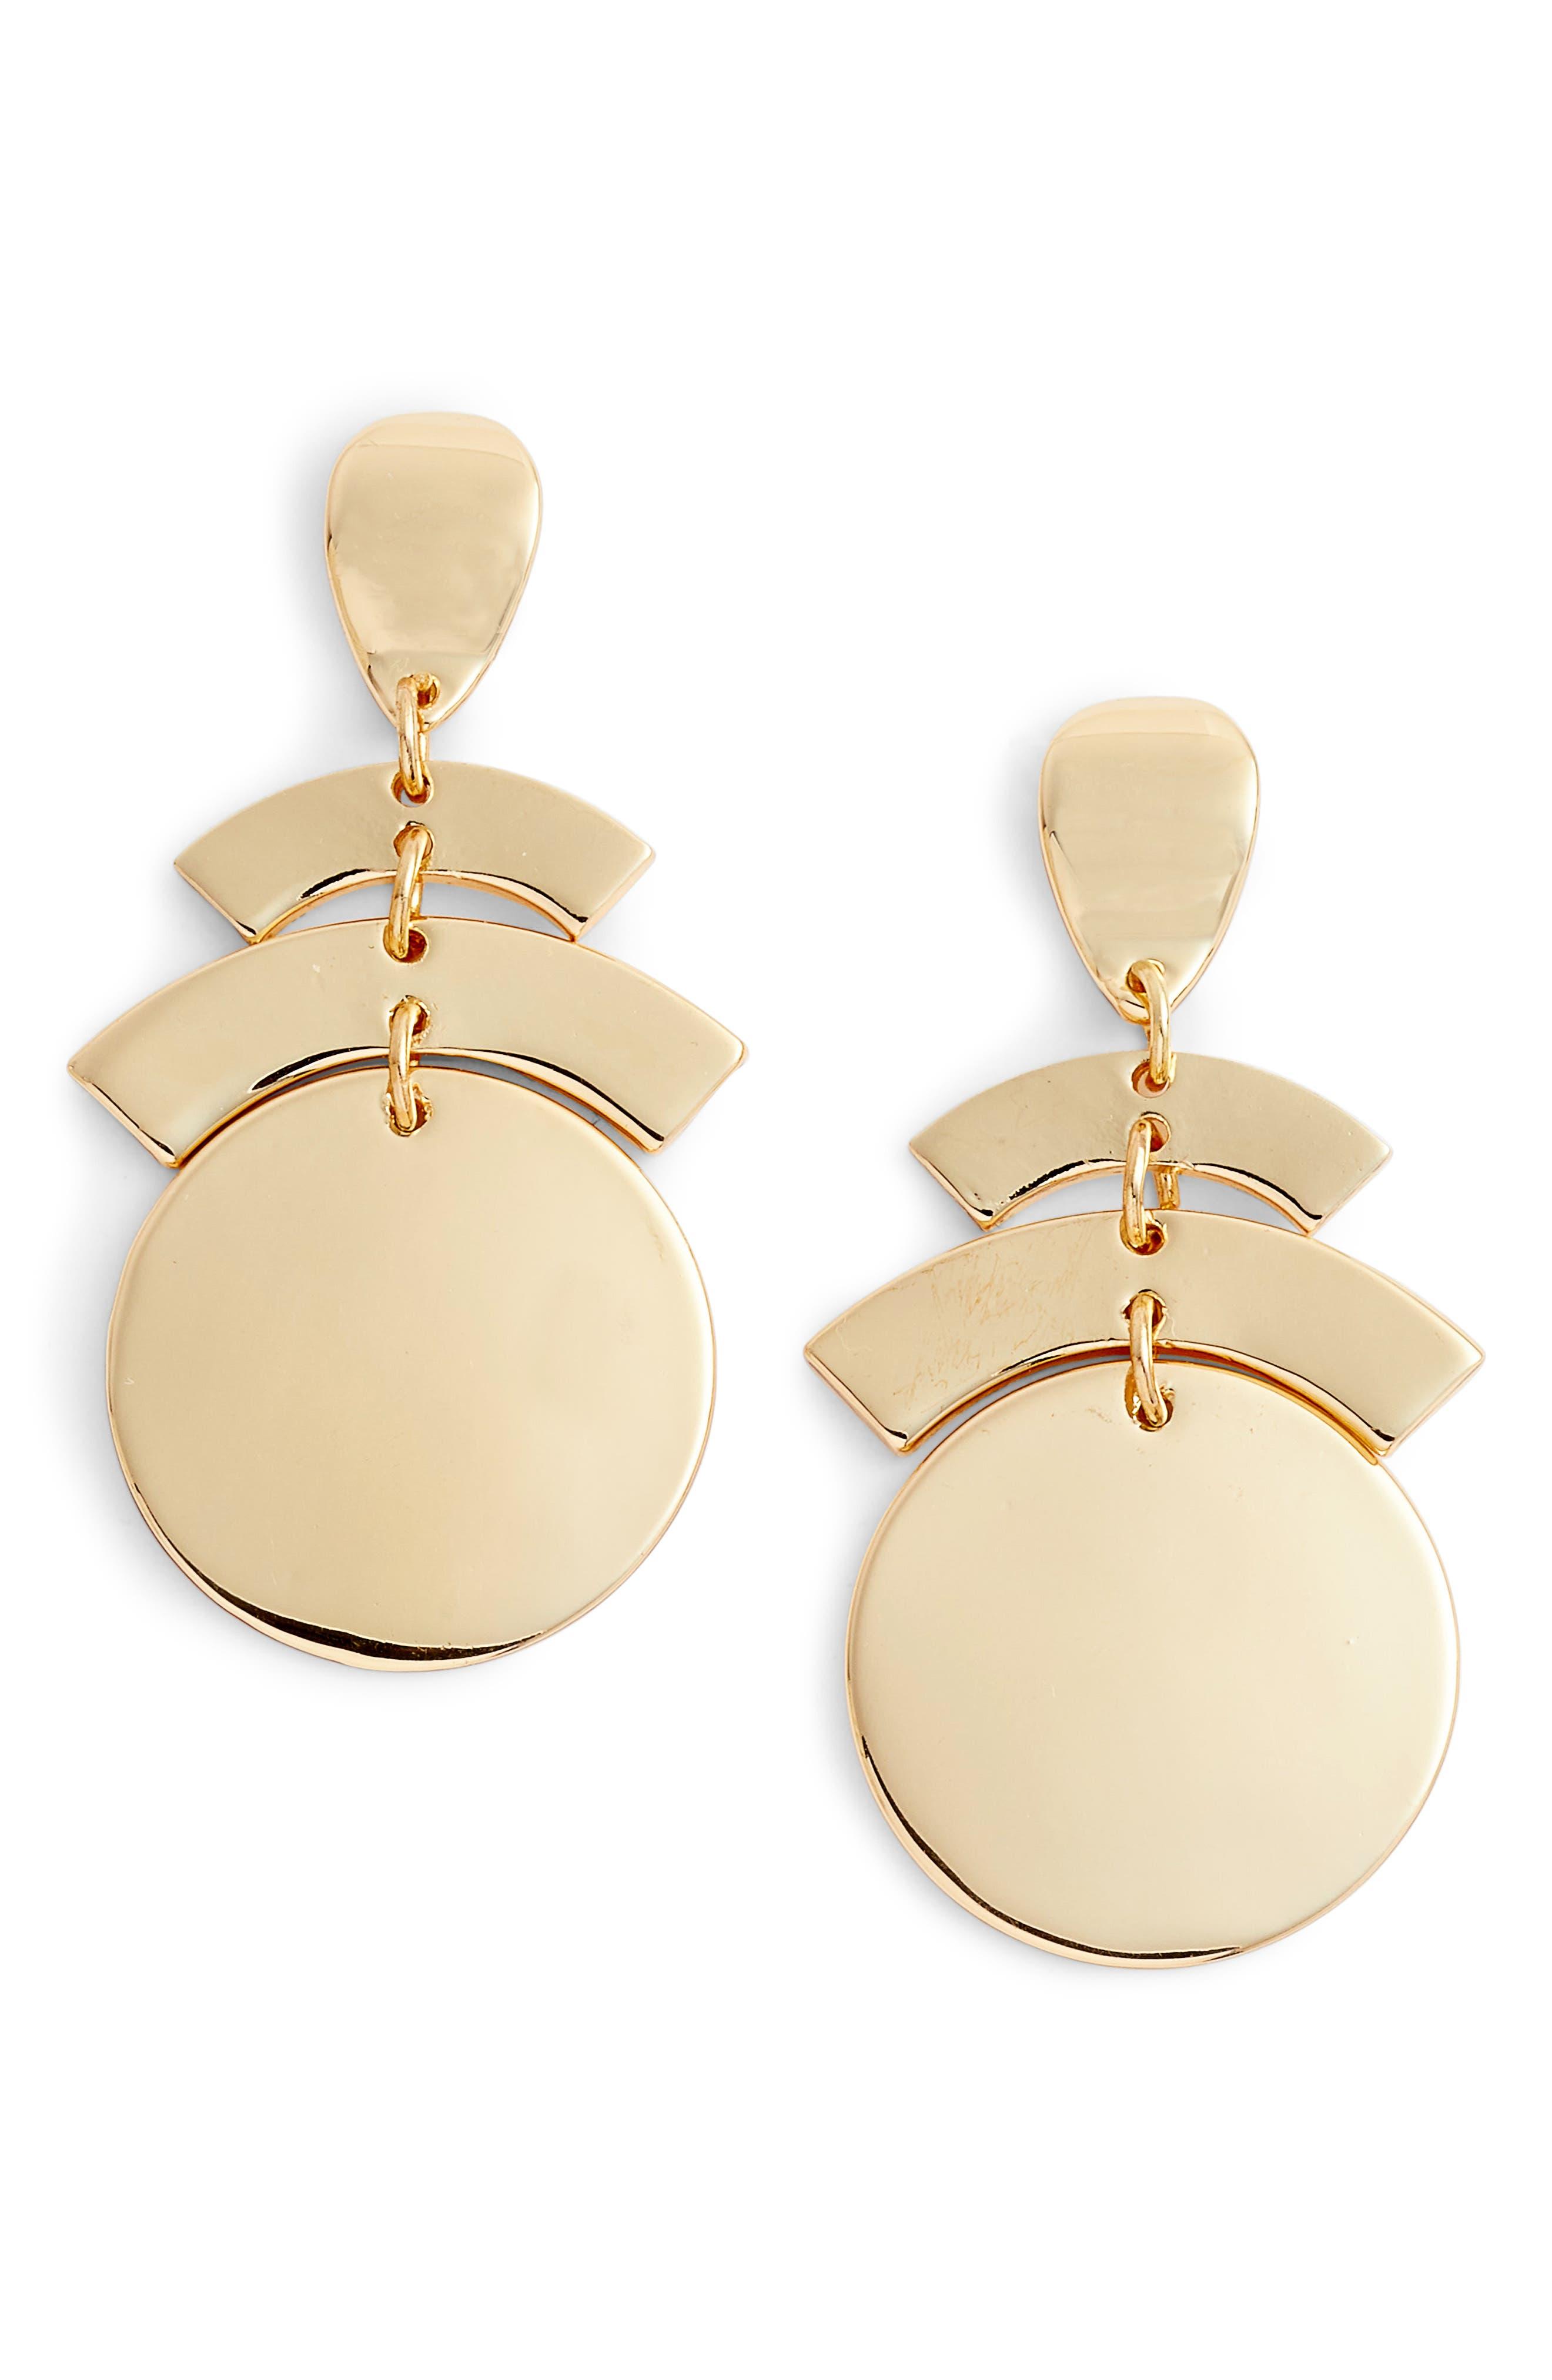 Geo Chandelier Earrings,                             Main thumbnail 1, color,                             Gold